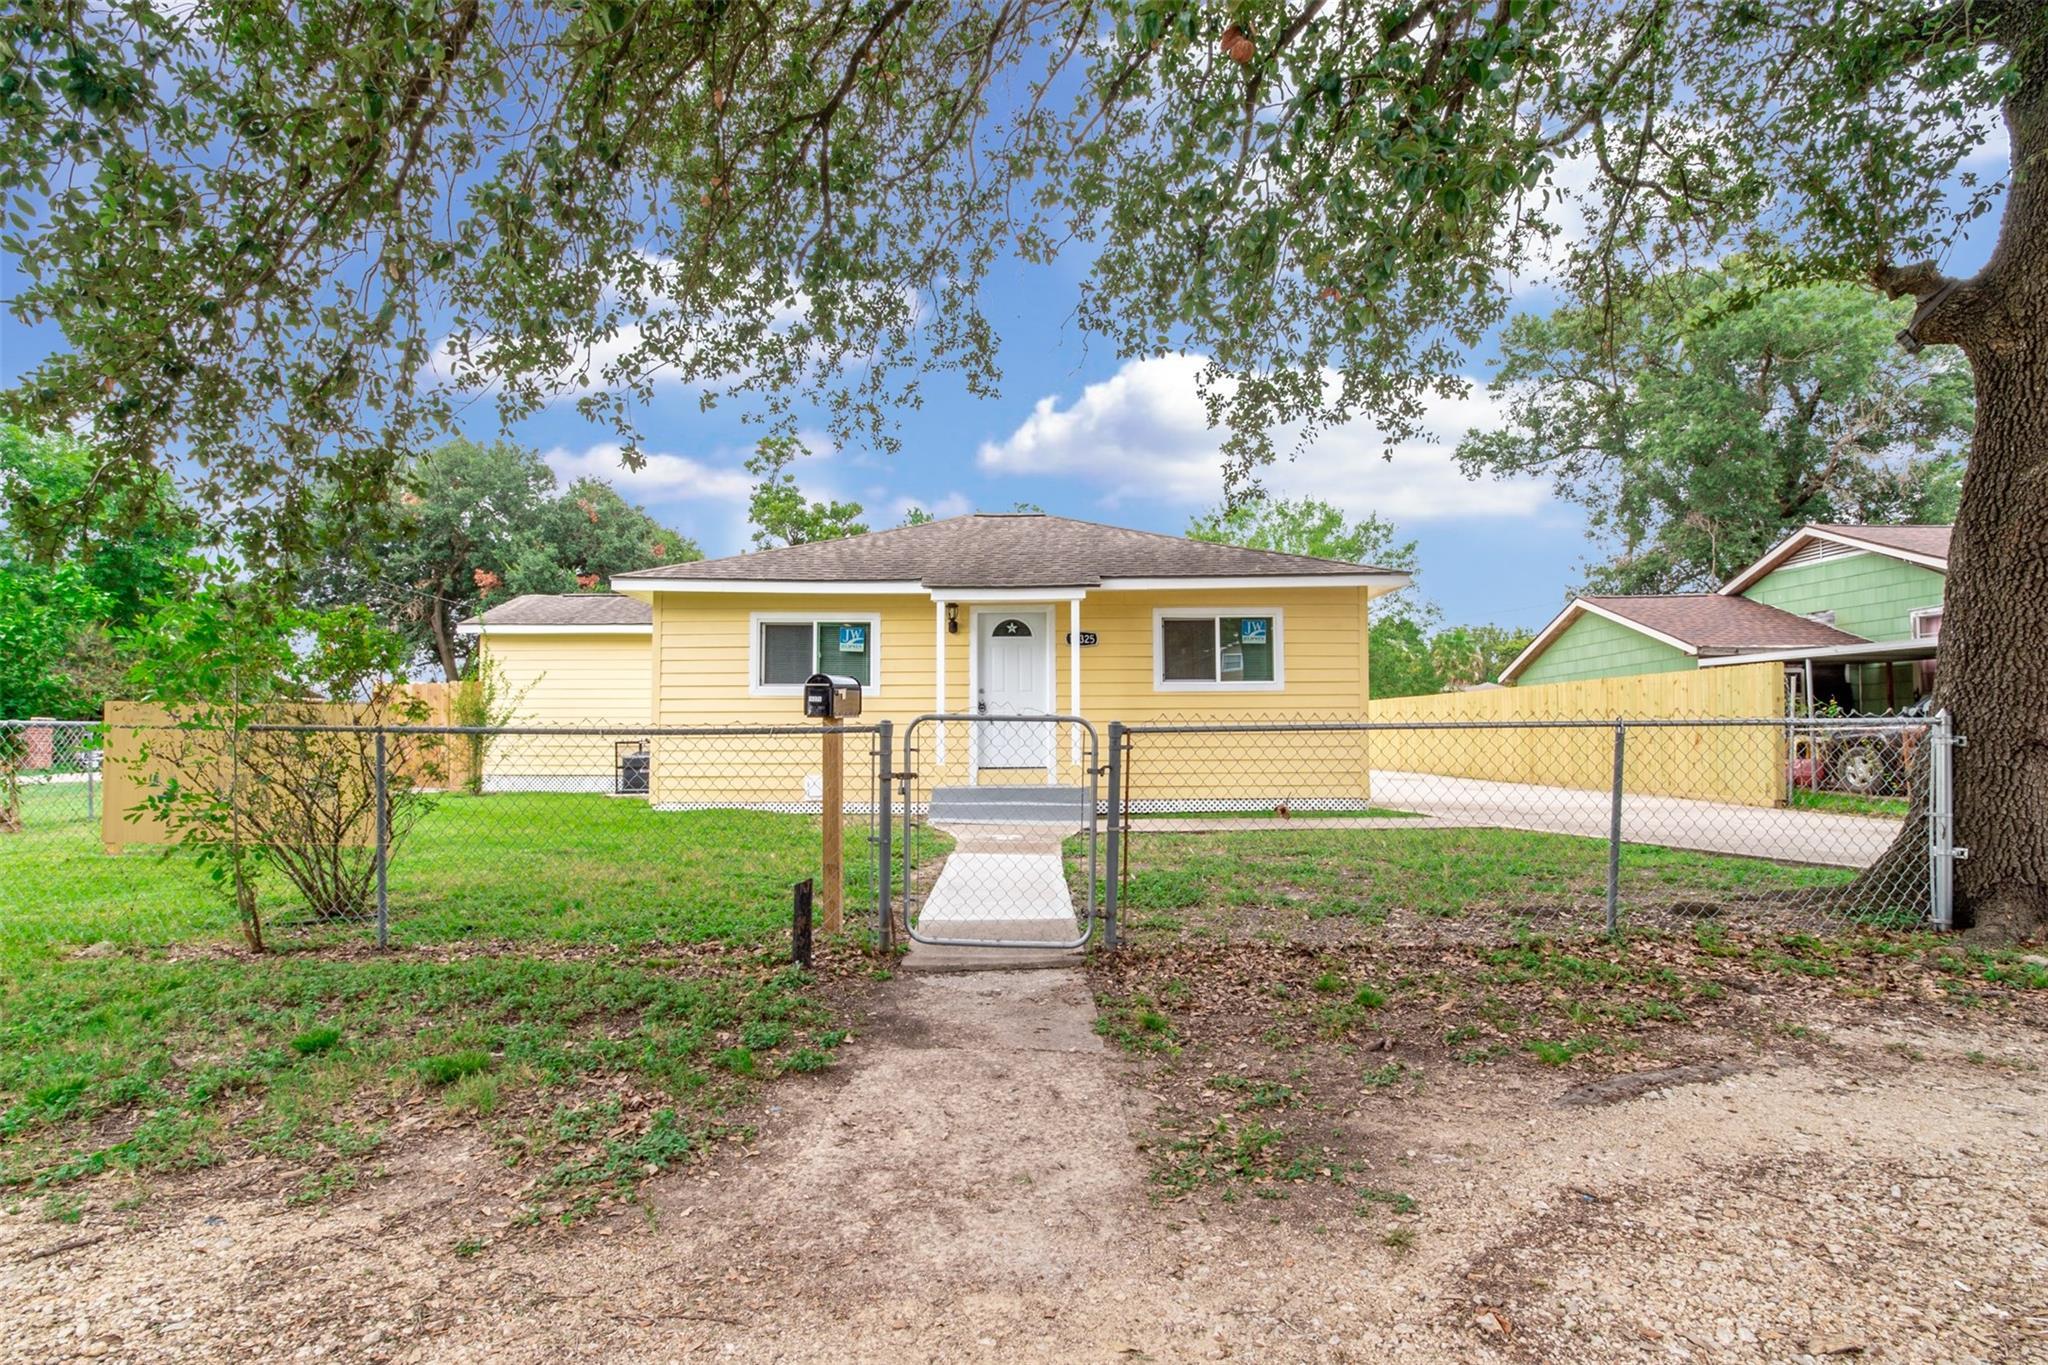 10325 N N Oswego Street Property Photo - Houston, TX real estate listing